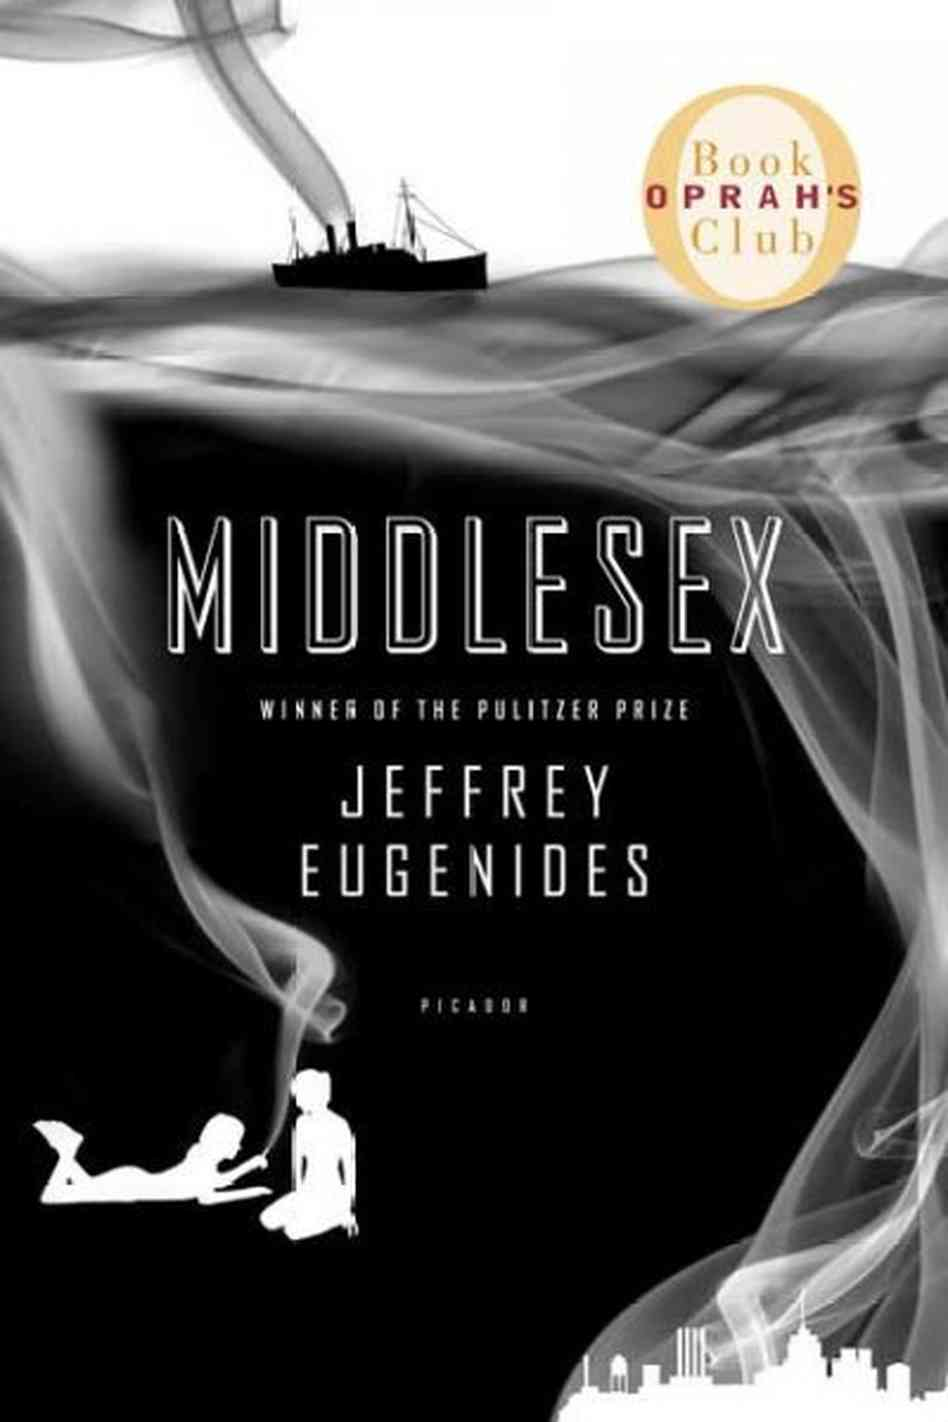 Michigan: Middlesex by Jeffrey Eugenides